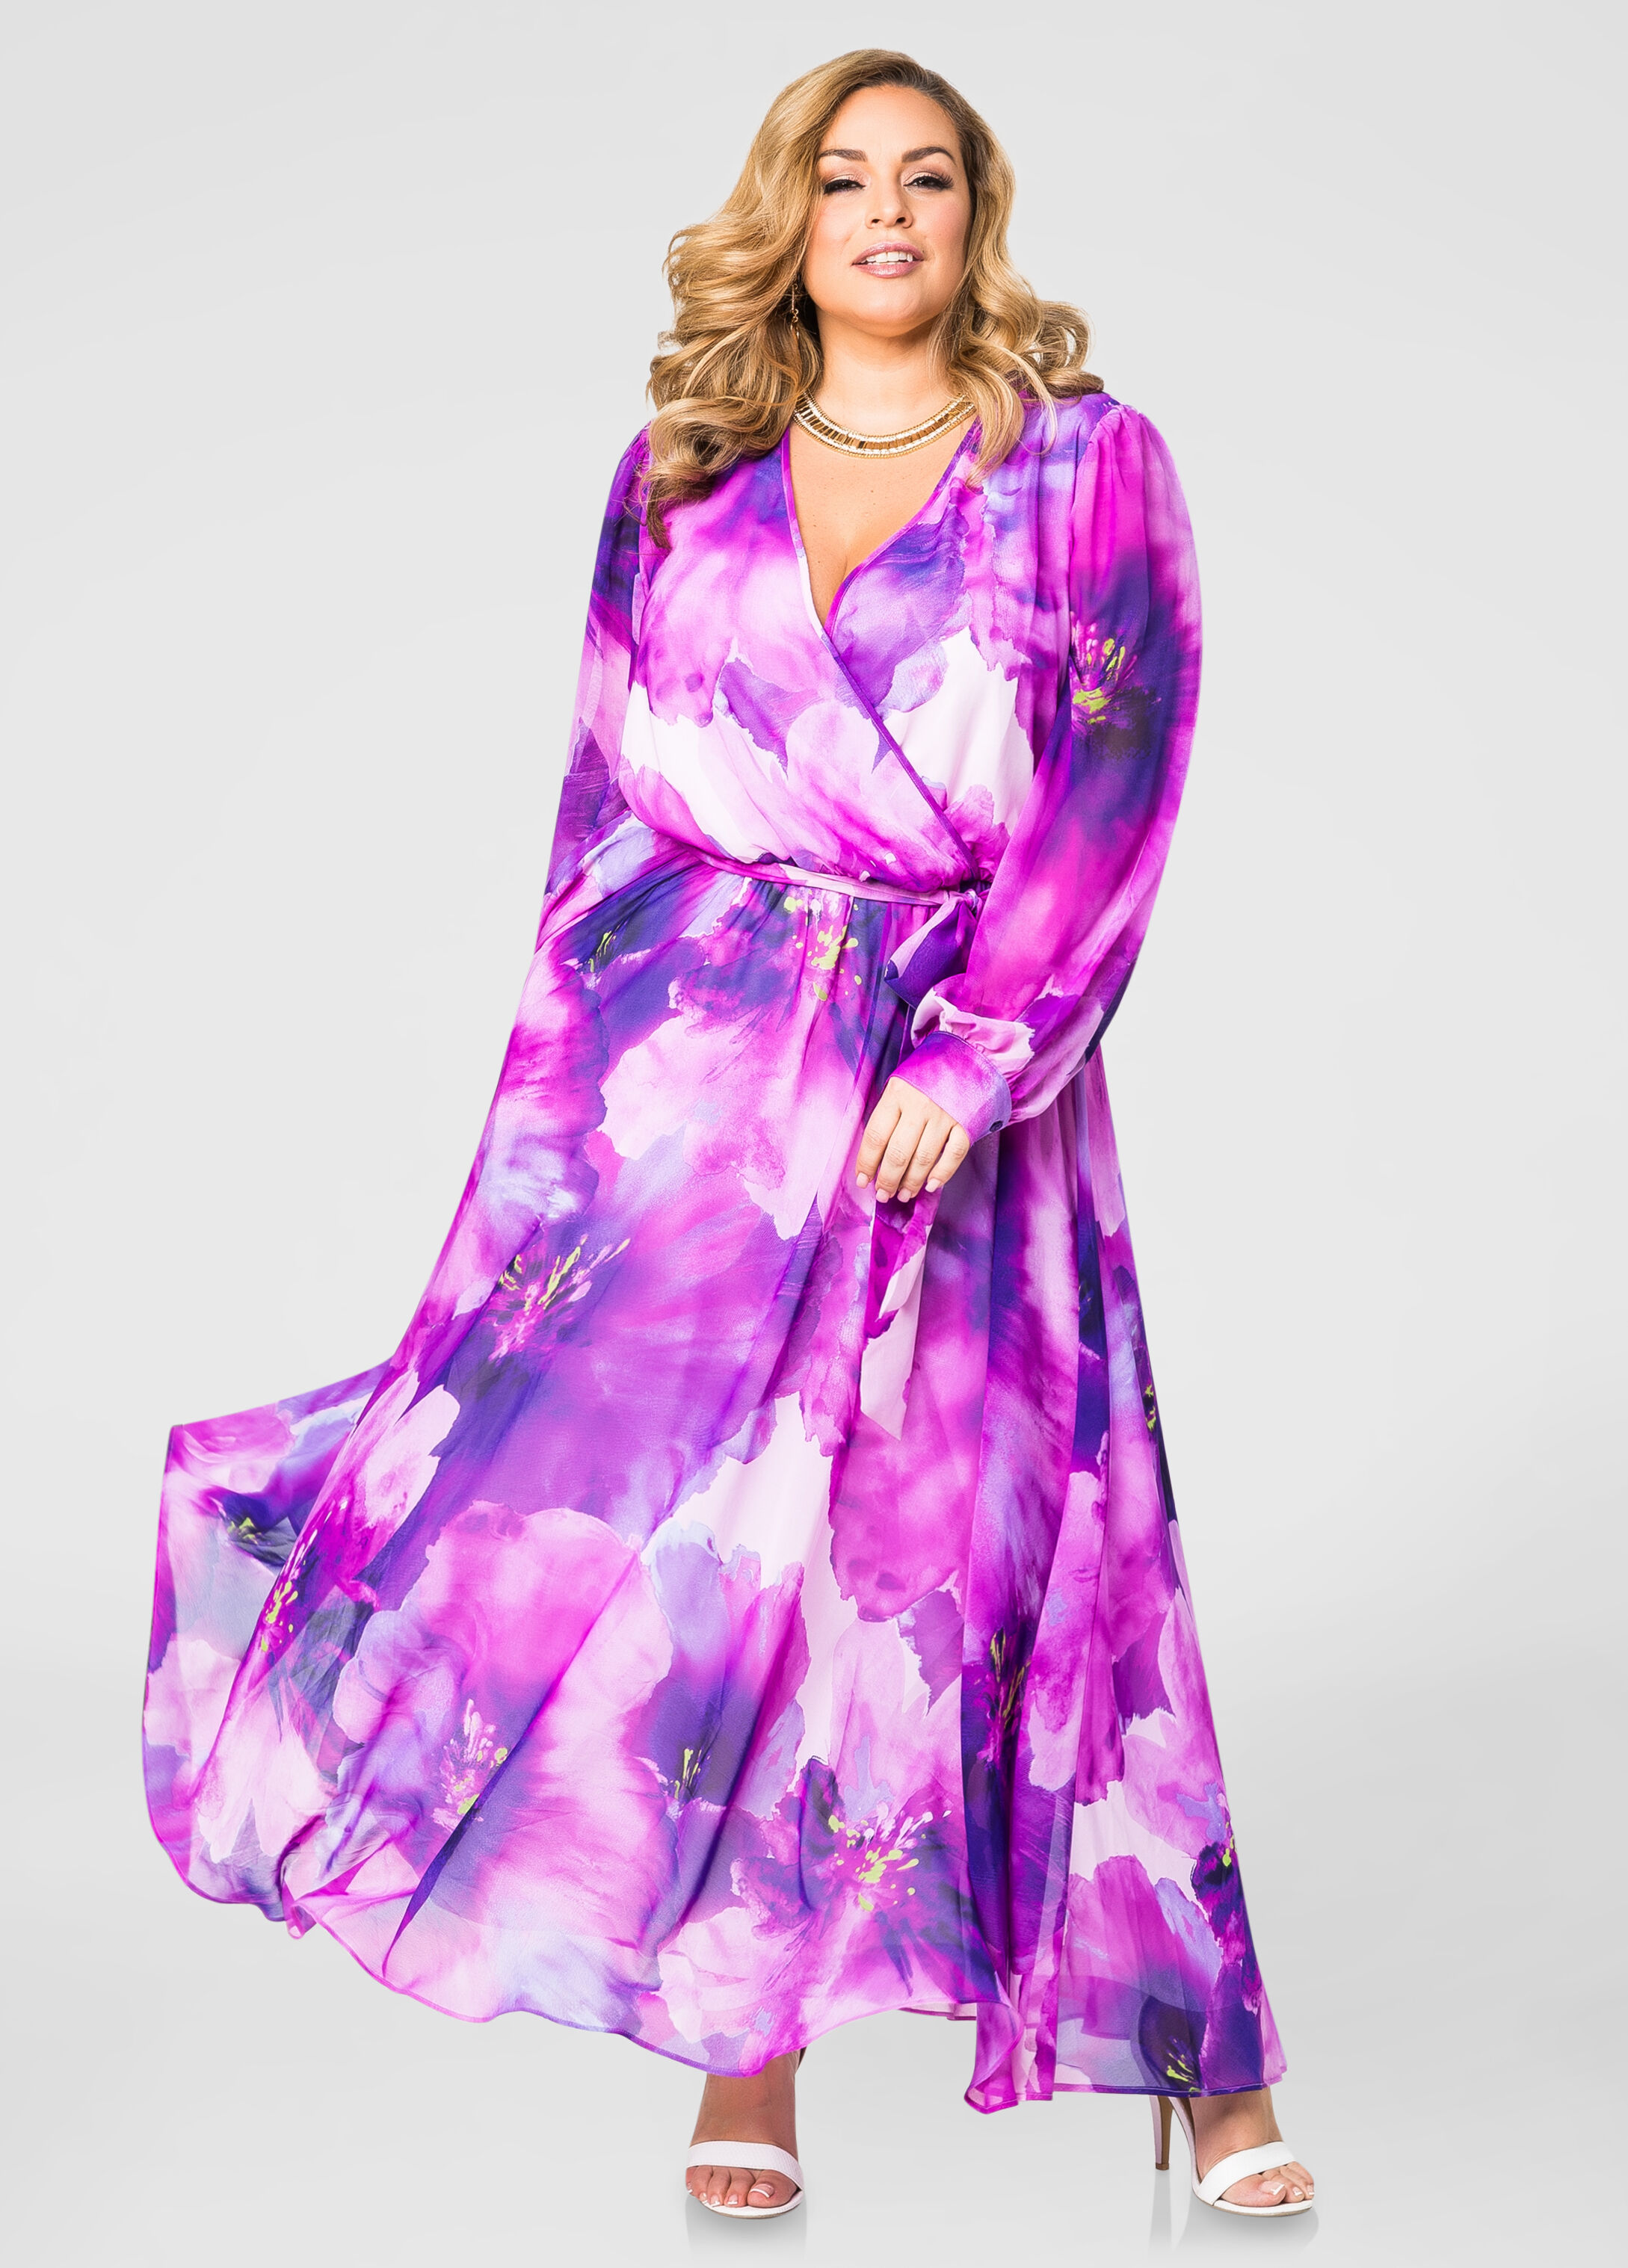 Surplice maxi dresses